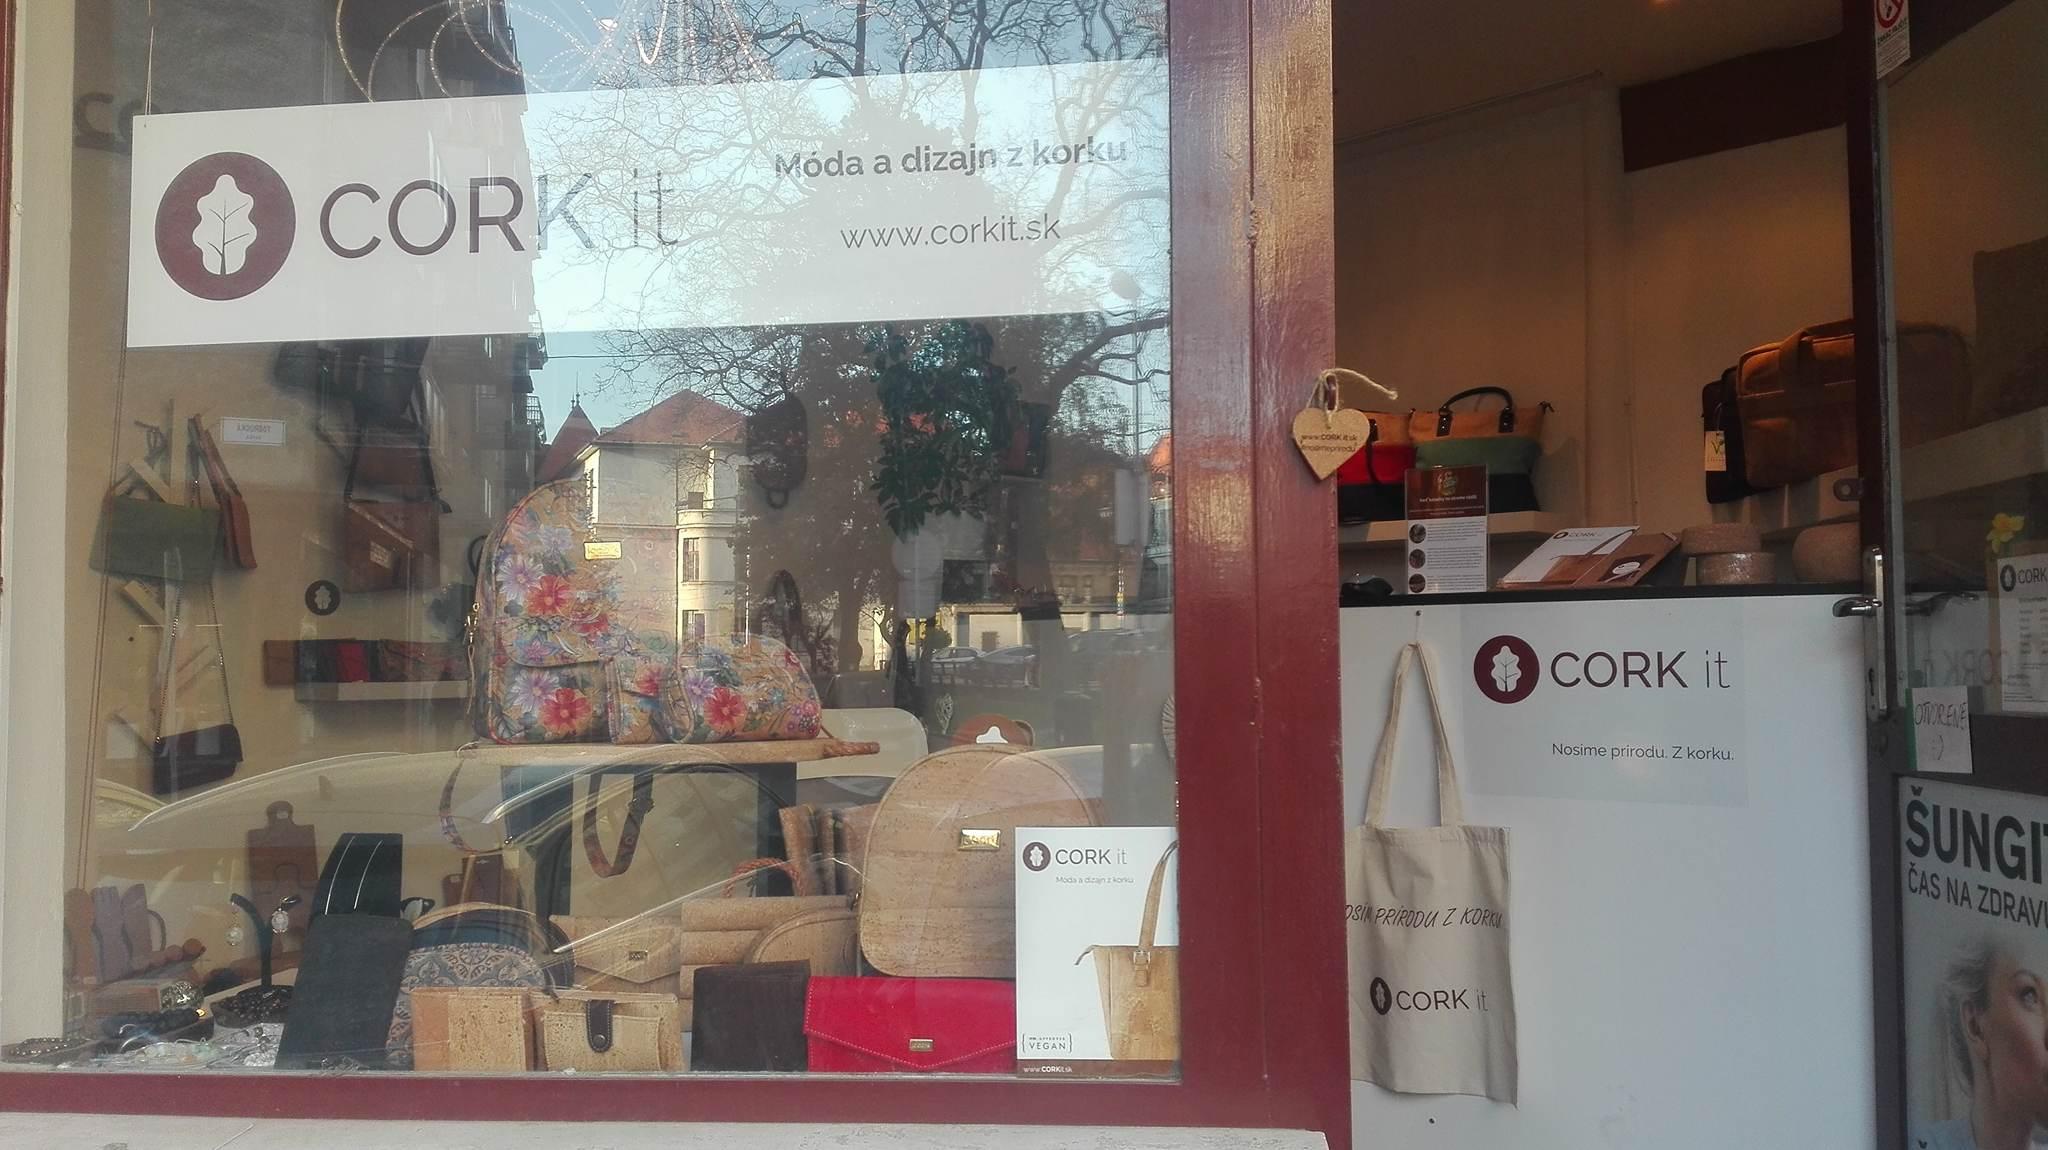 Smutno-veselý oznam: Rušíme showroom na Dobrovičovej 1 v Bratislave